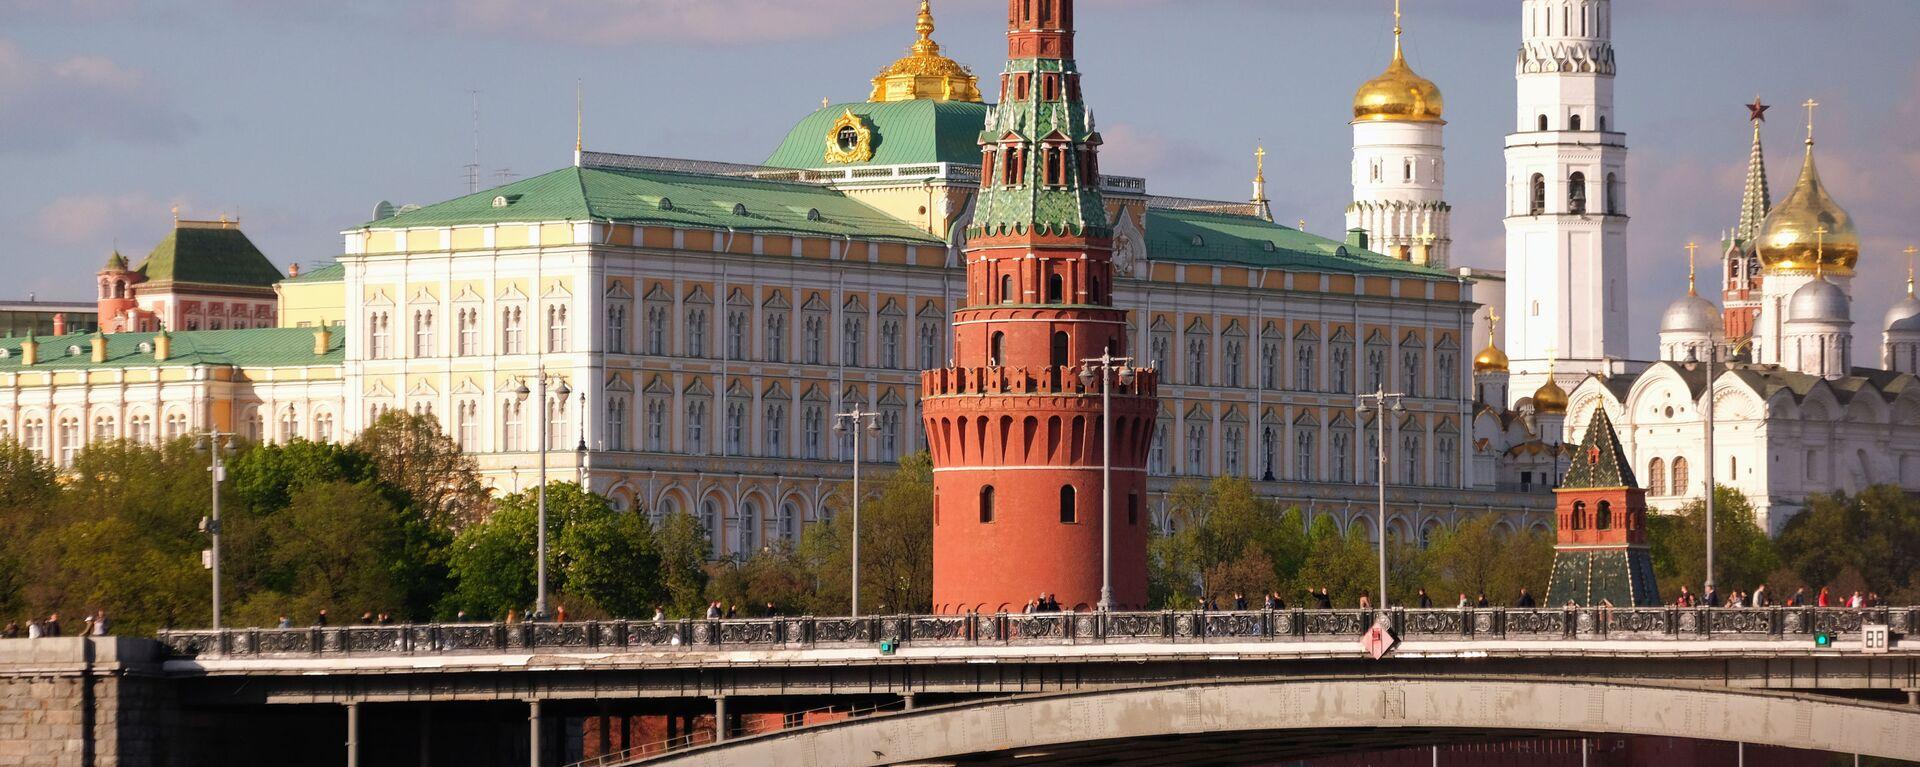 Moskiewski Kreml - Sputnik Polska, 1920, 25.05.2021